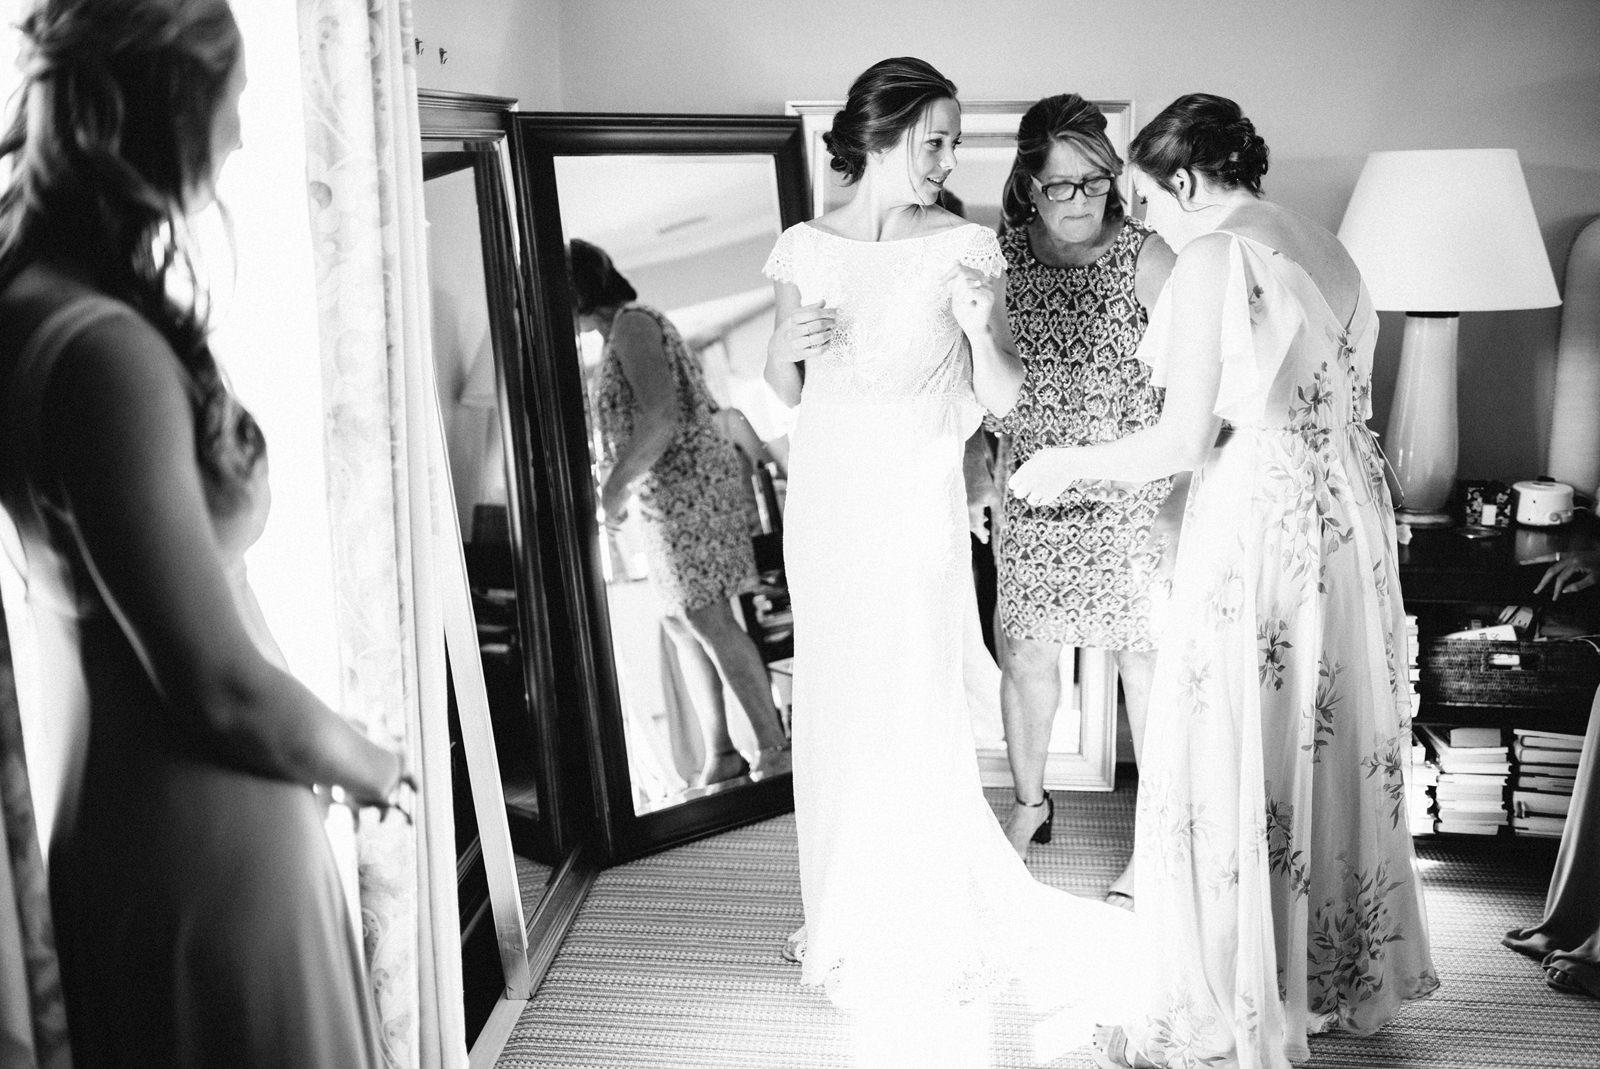 bridgeport-wedding-024 BRIDGEPORT, CONNECTICUT BACKYARD WEDDING